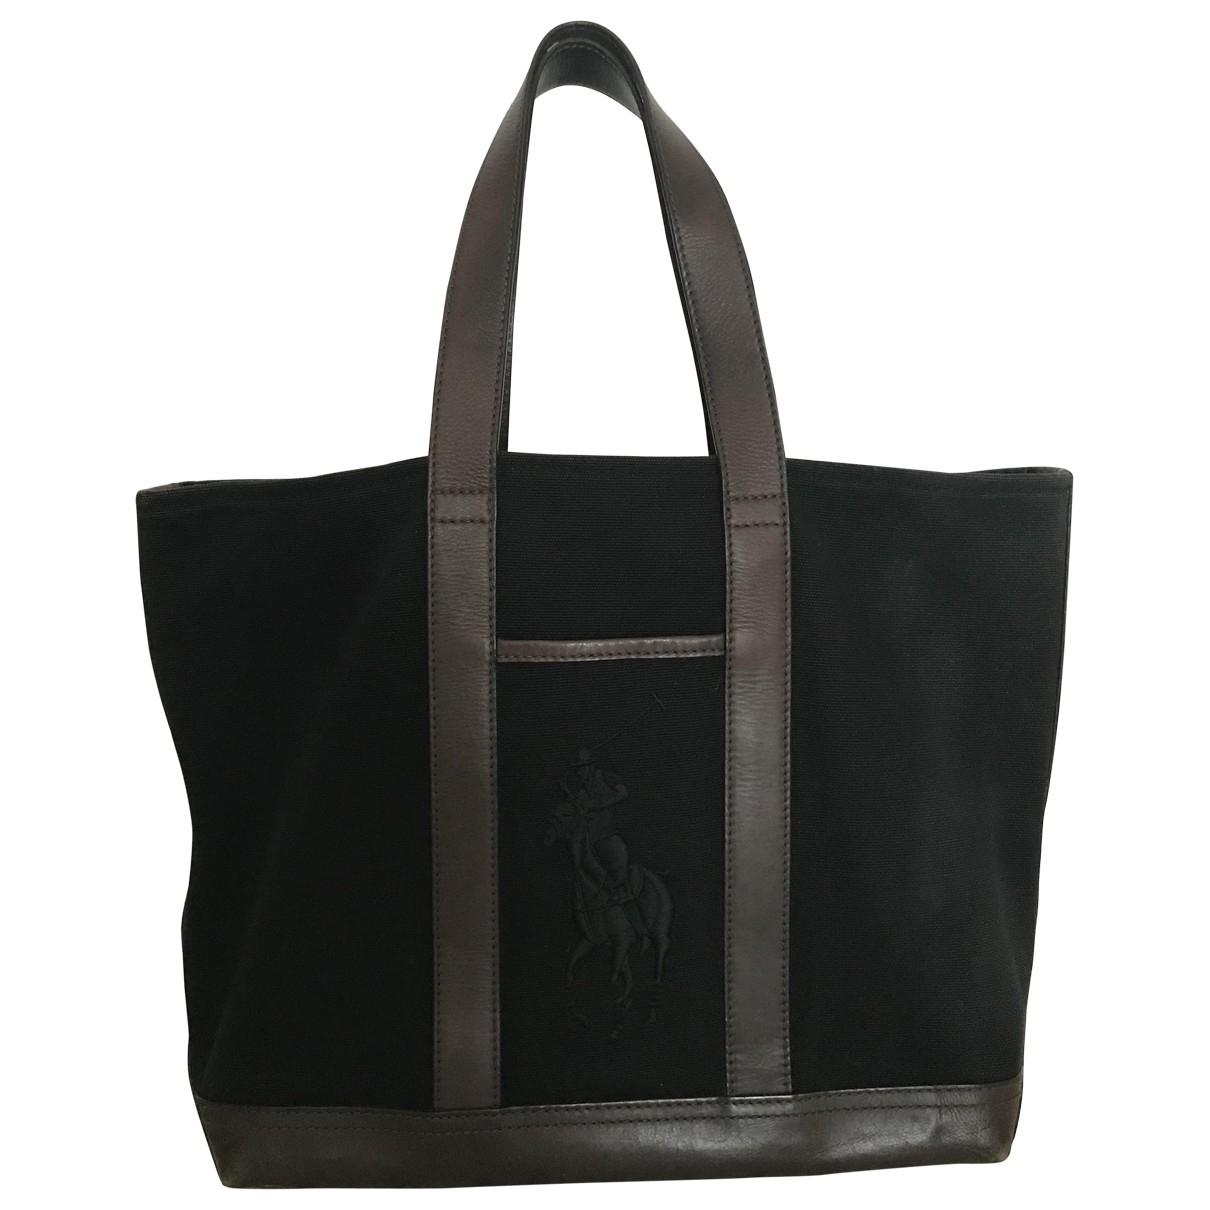 Ralph Lauren \N Black Cotton handbag for Women \N